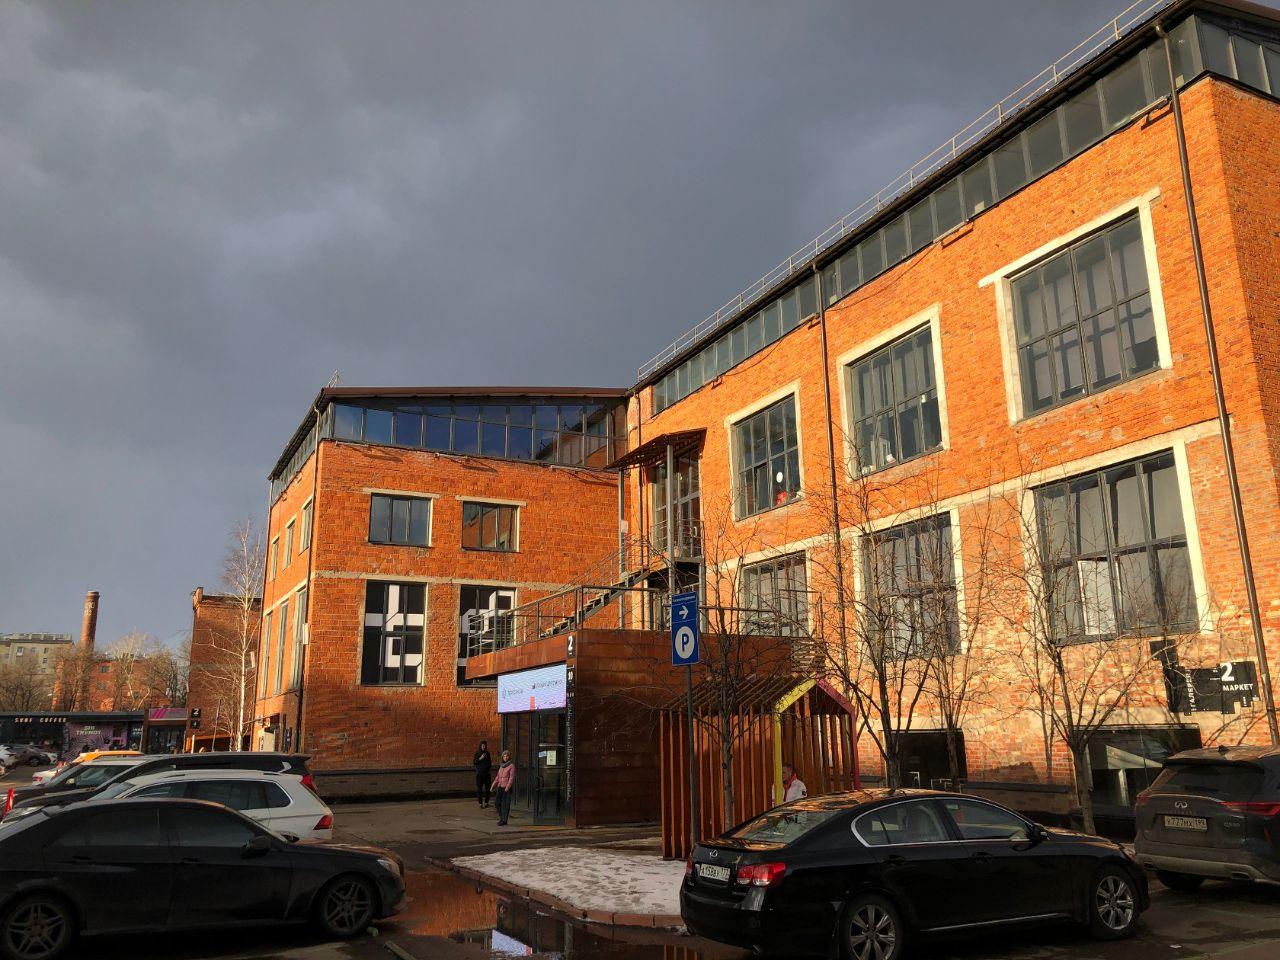 аренда помещений в БЦ Дизайн-завод «Flacon» (Дизайн-завод «Флакон») (36с2)